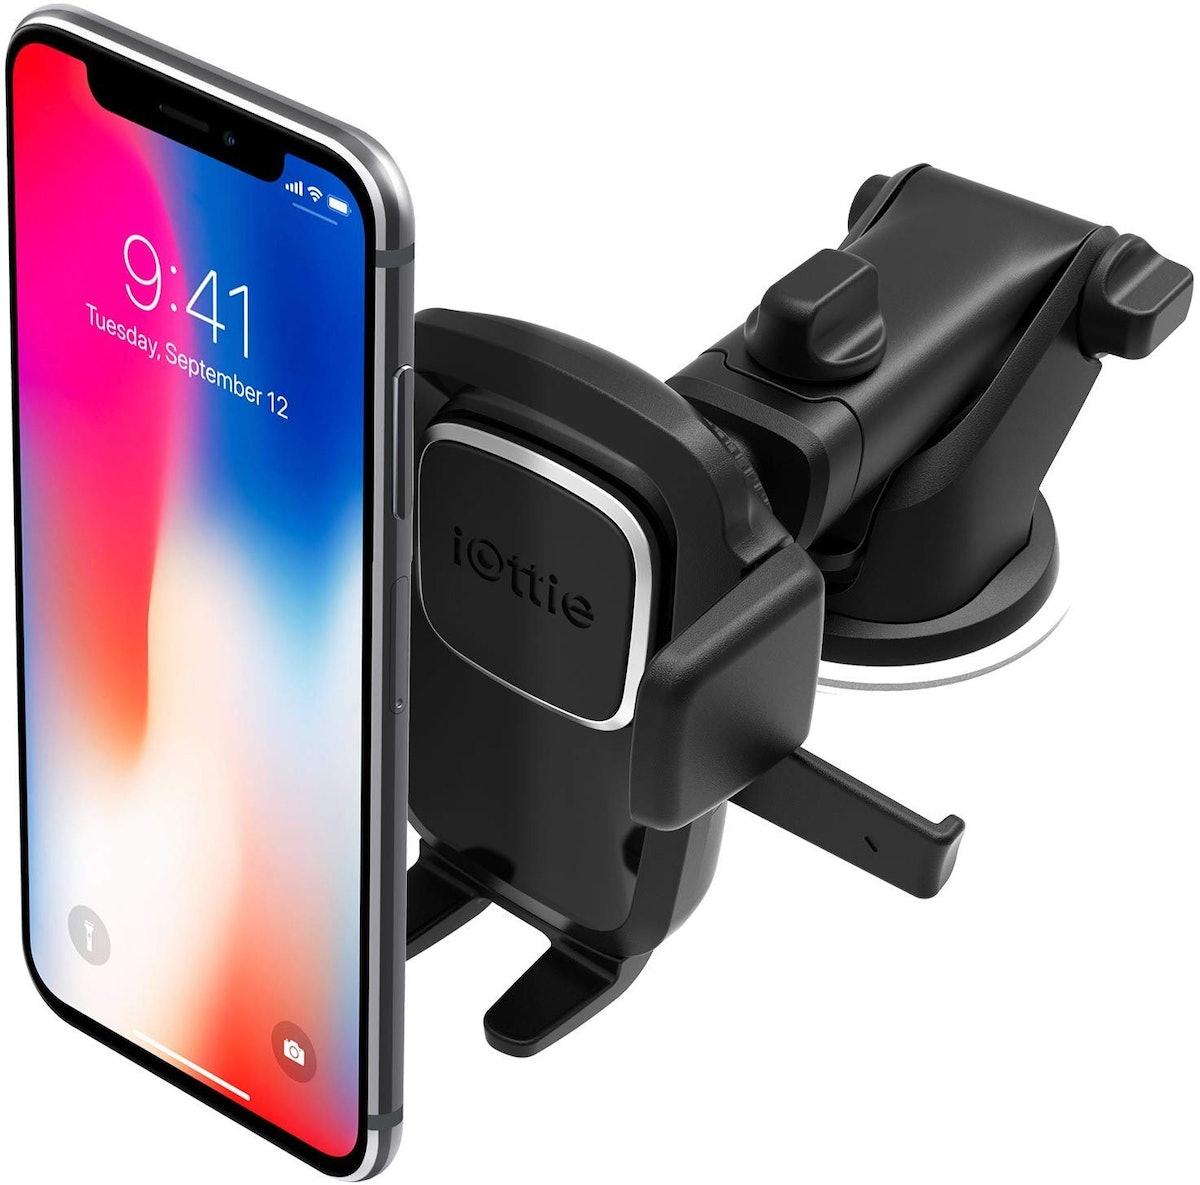 iOttie Universal Car Phone Mount